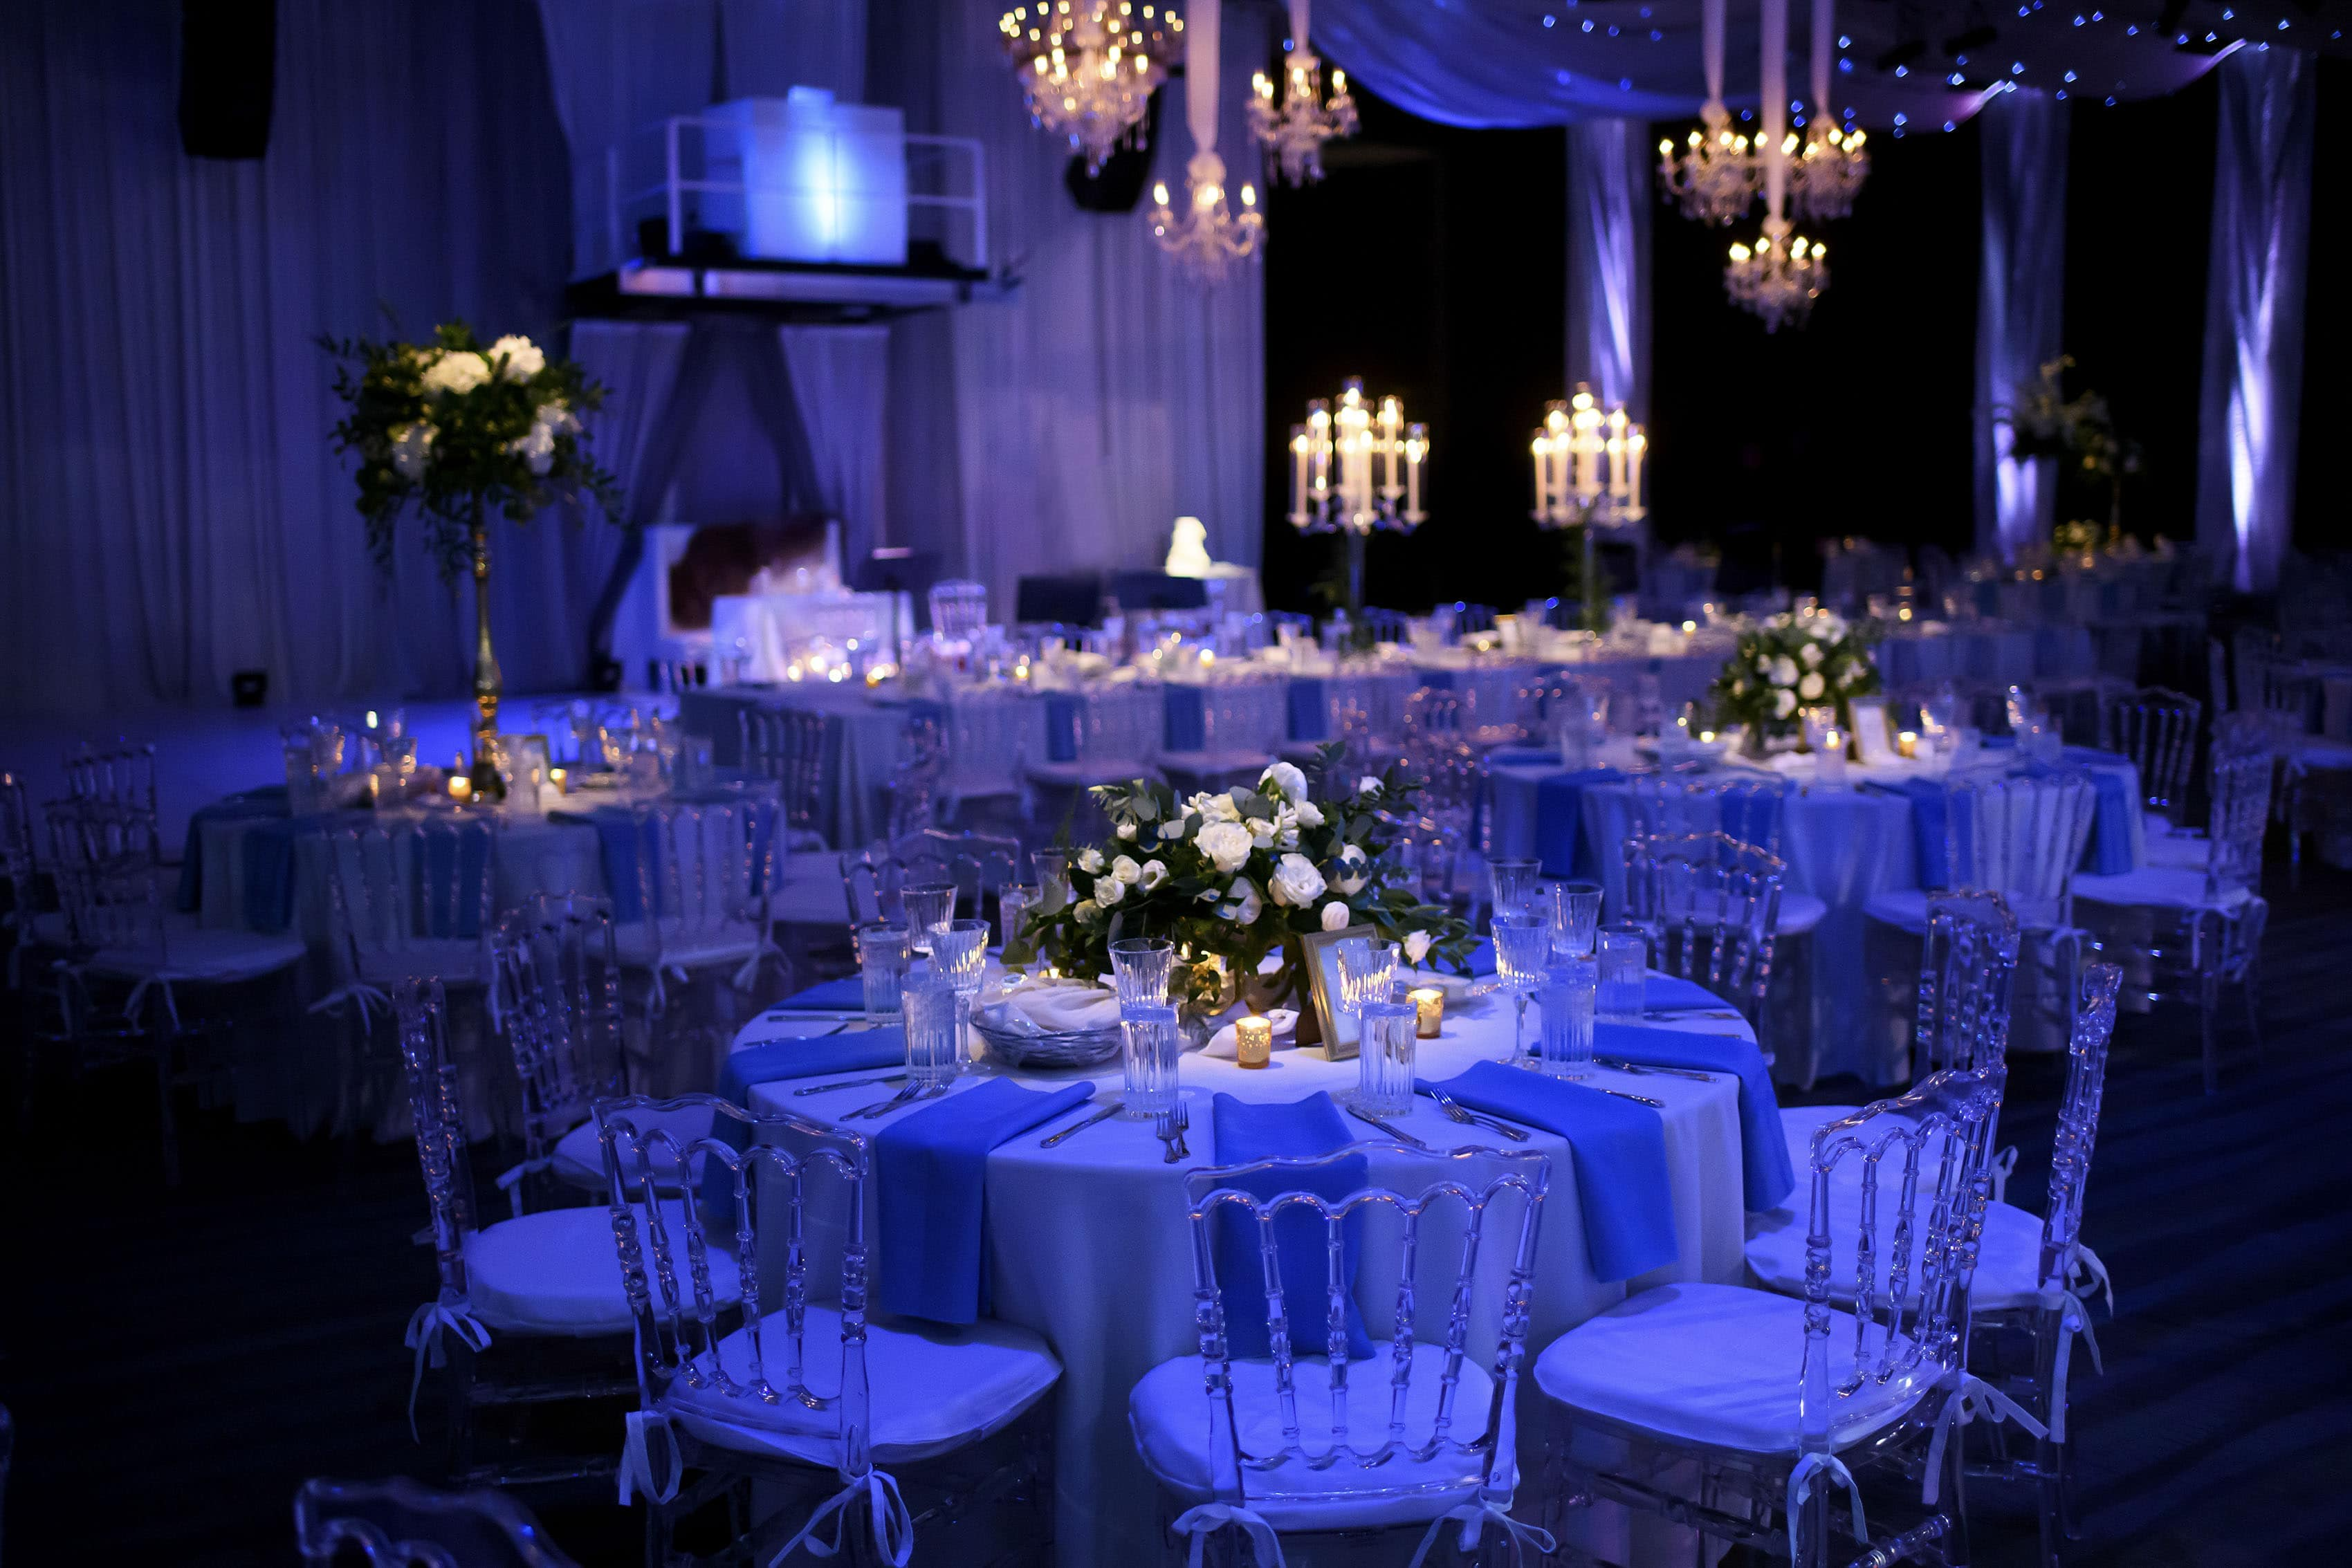 Seawell Ballroom table setup for a Greek wedding reception